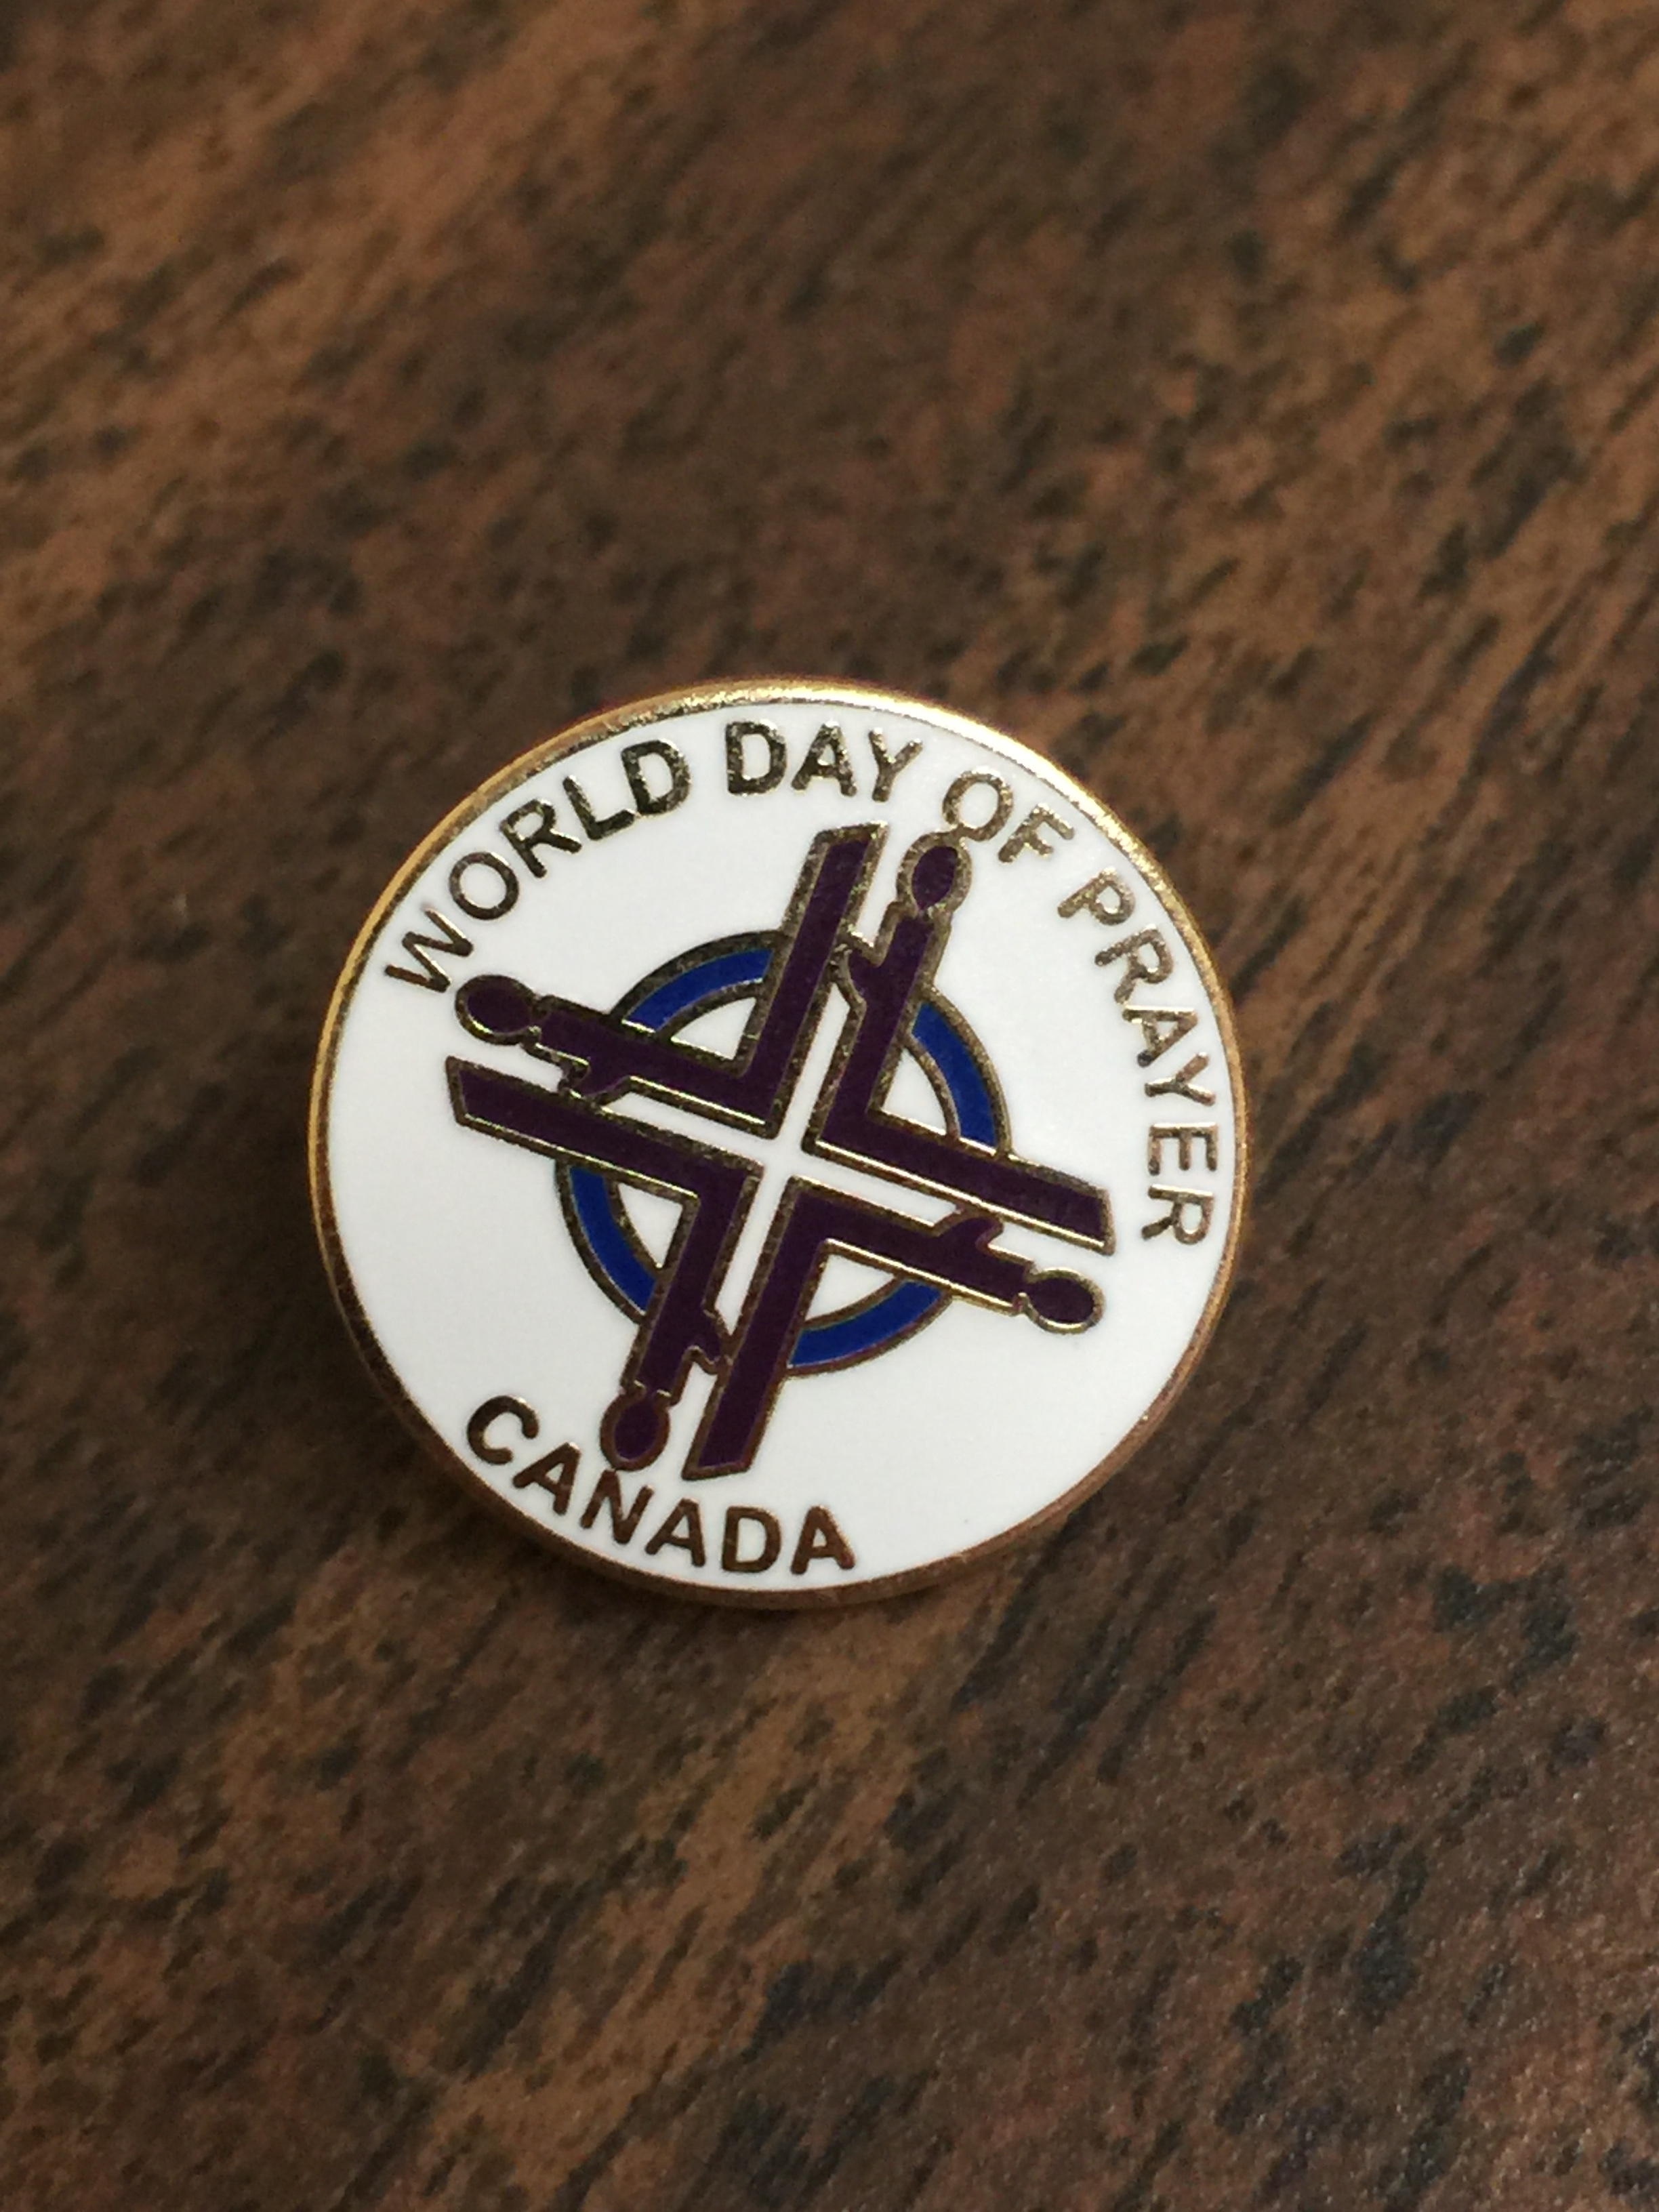 World Day of Prayer Pin